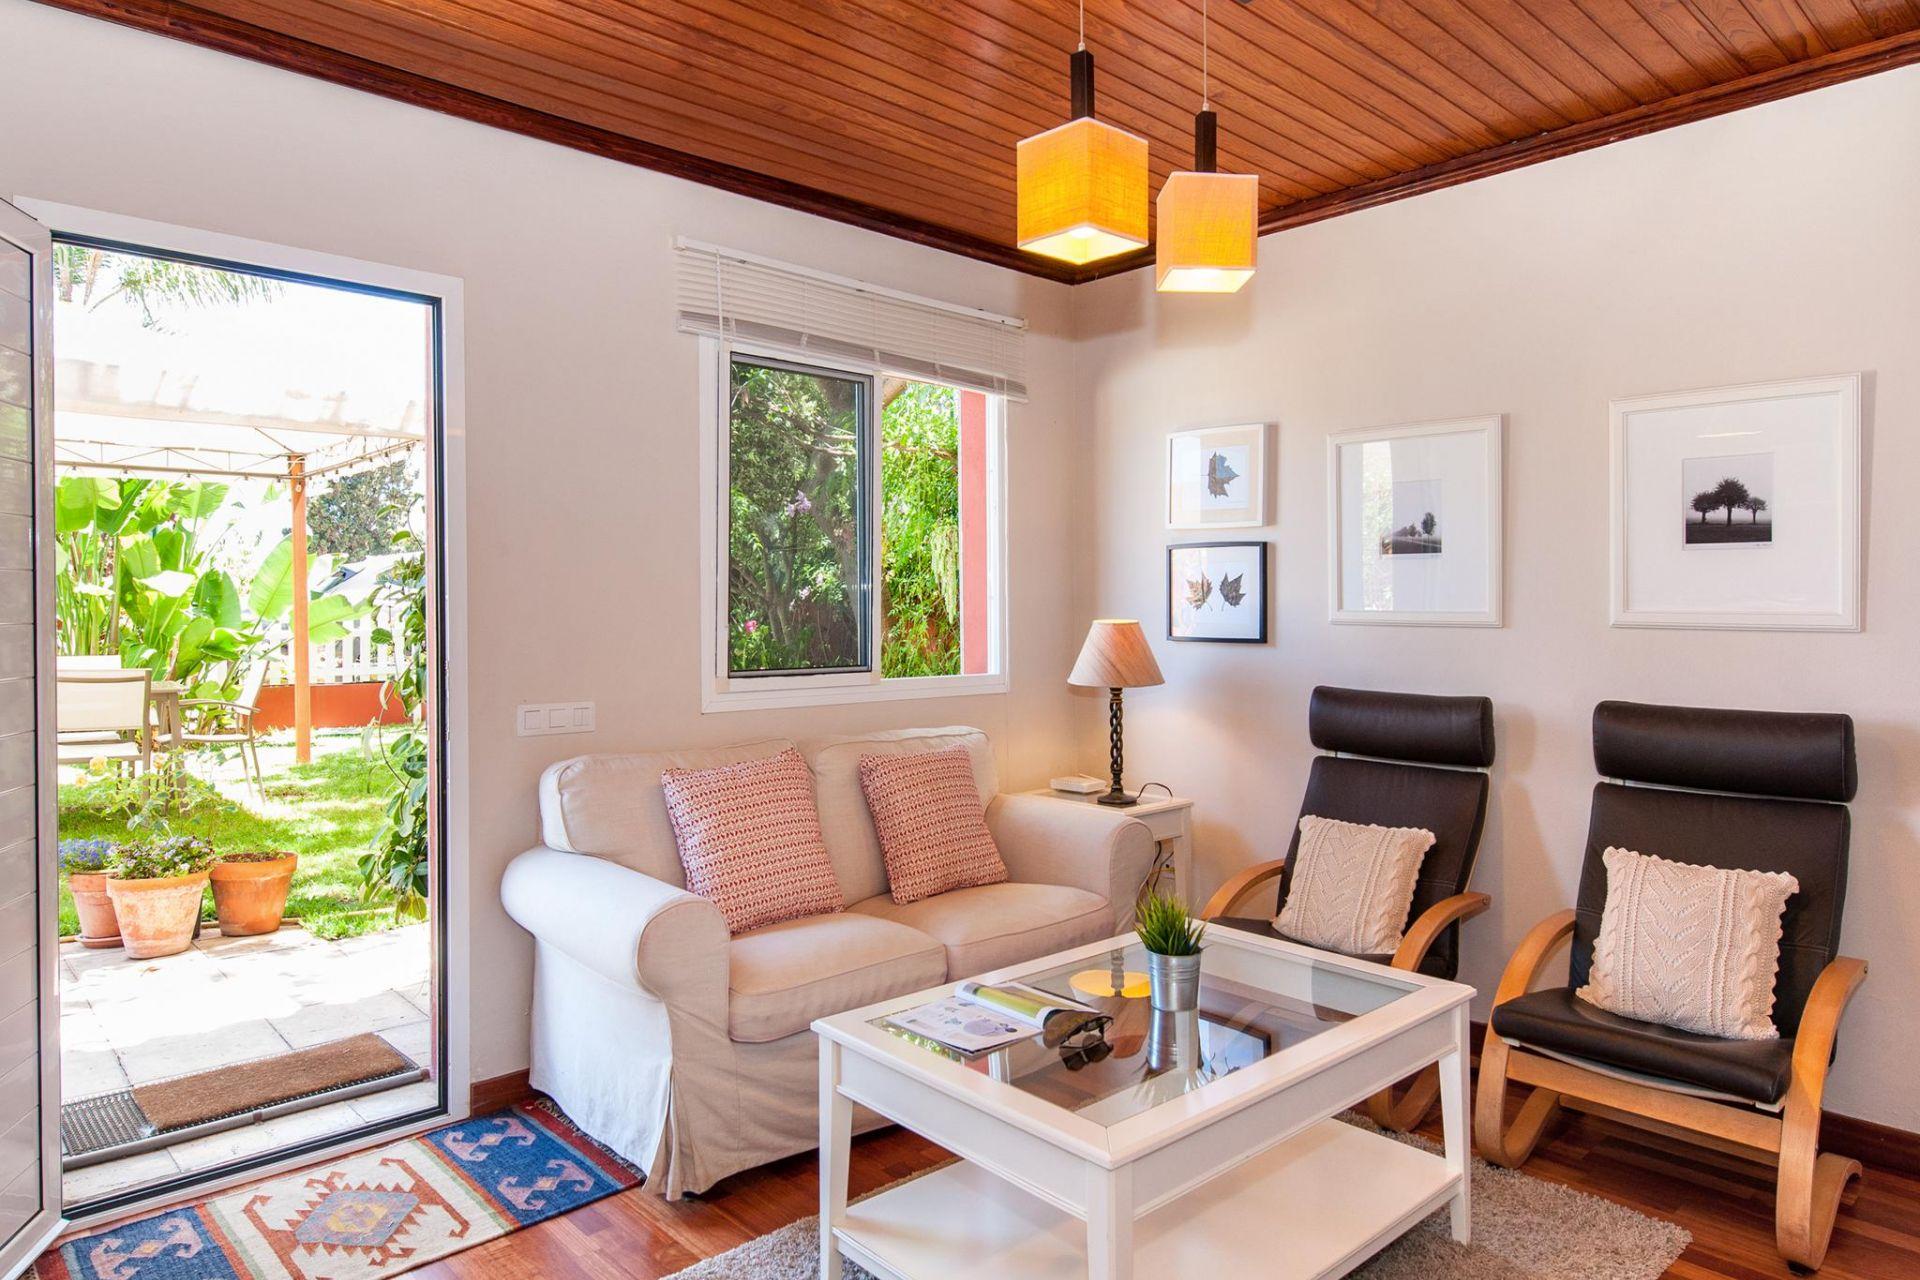 Acogedor apartamento en zona rural con piscina privada en for Apartamentos con piscina privada